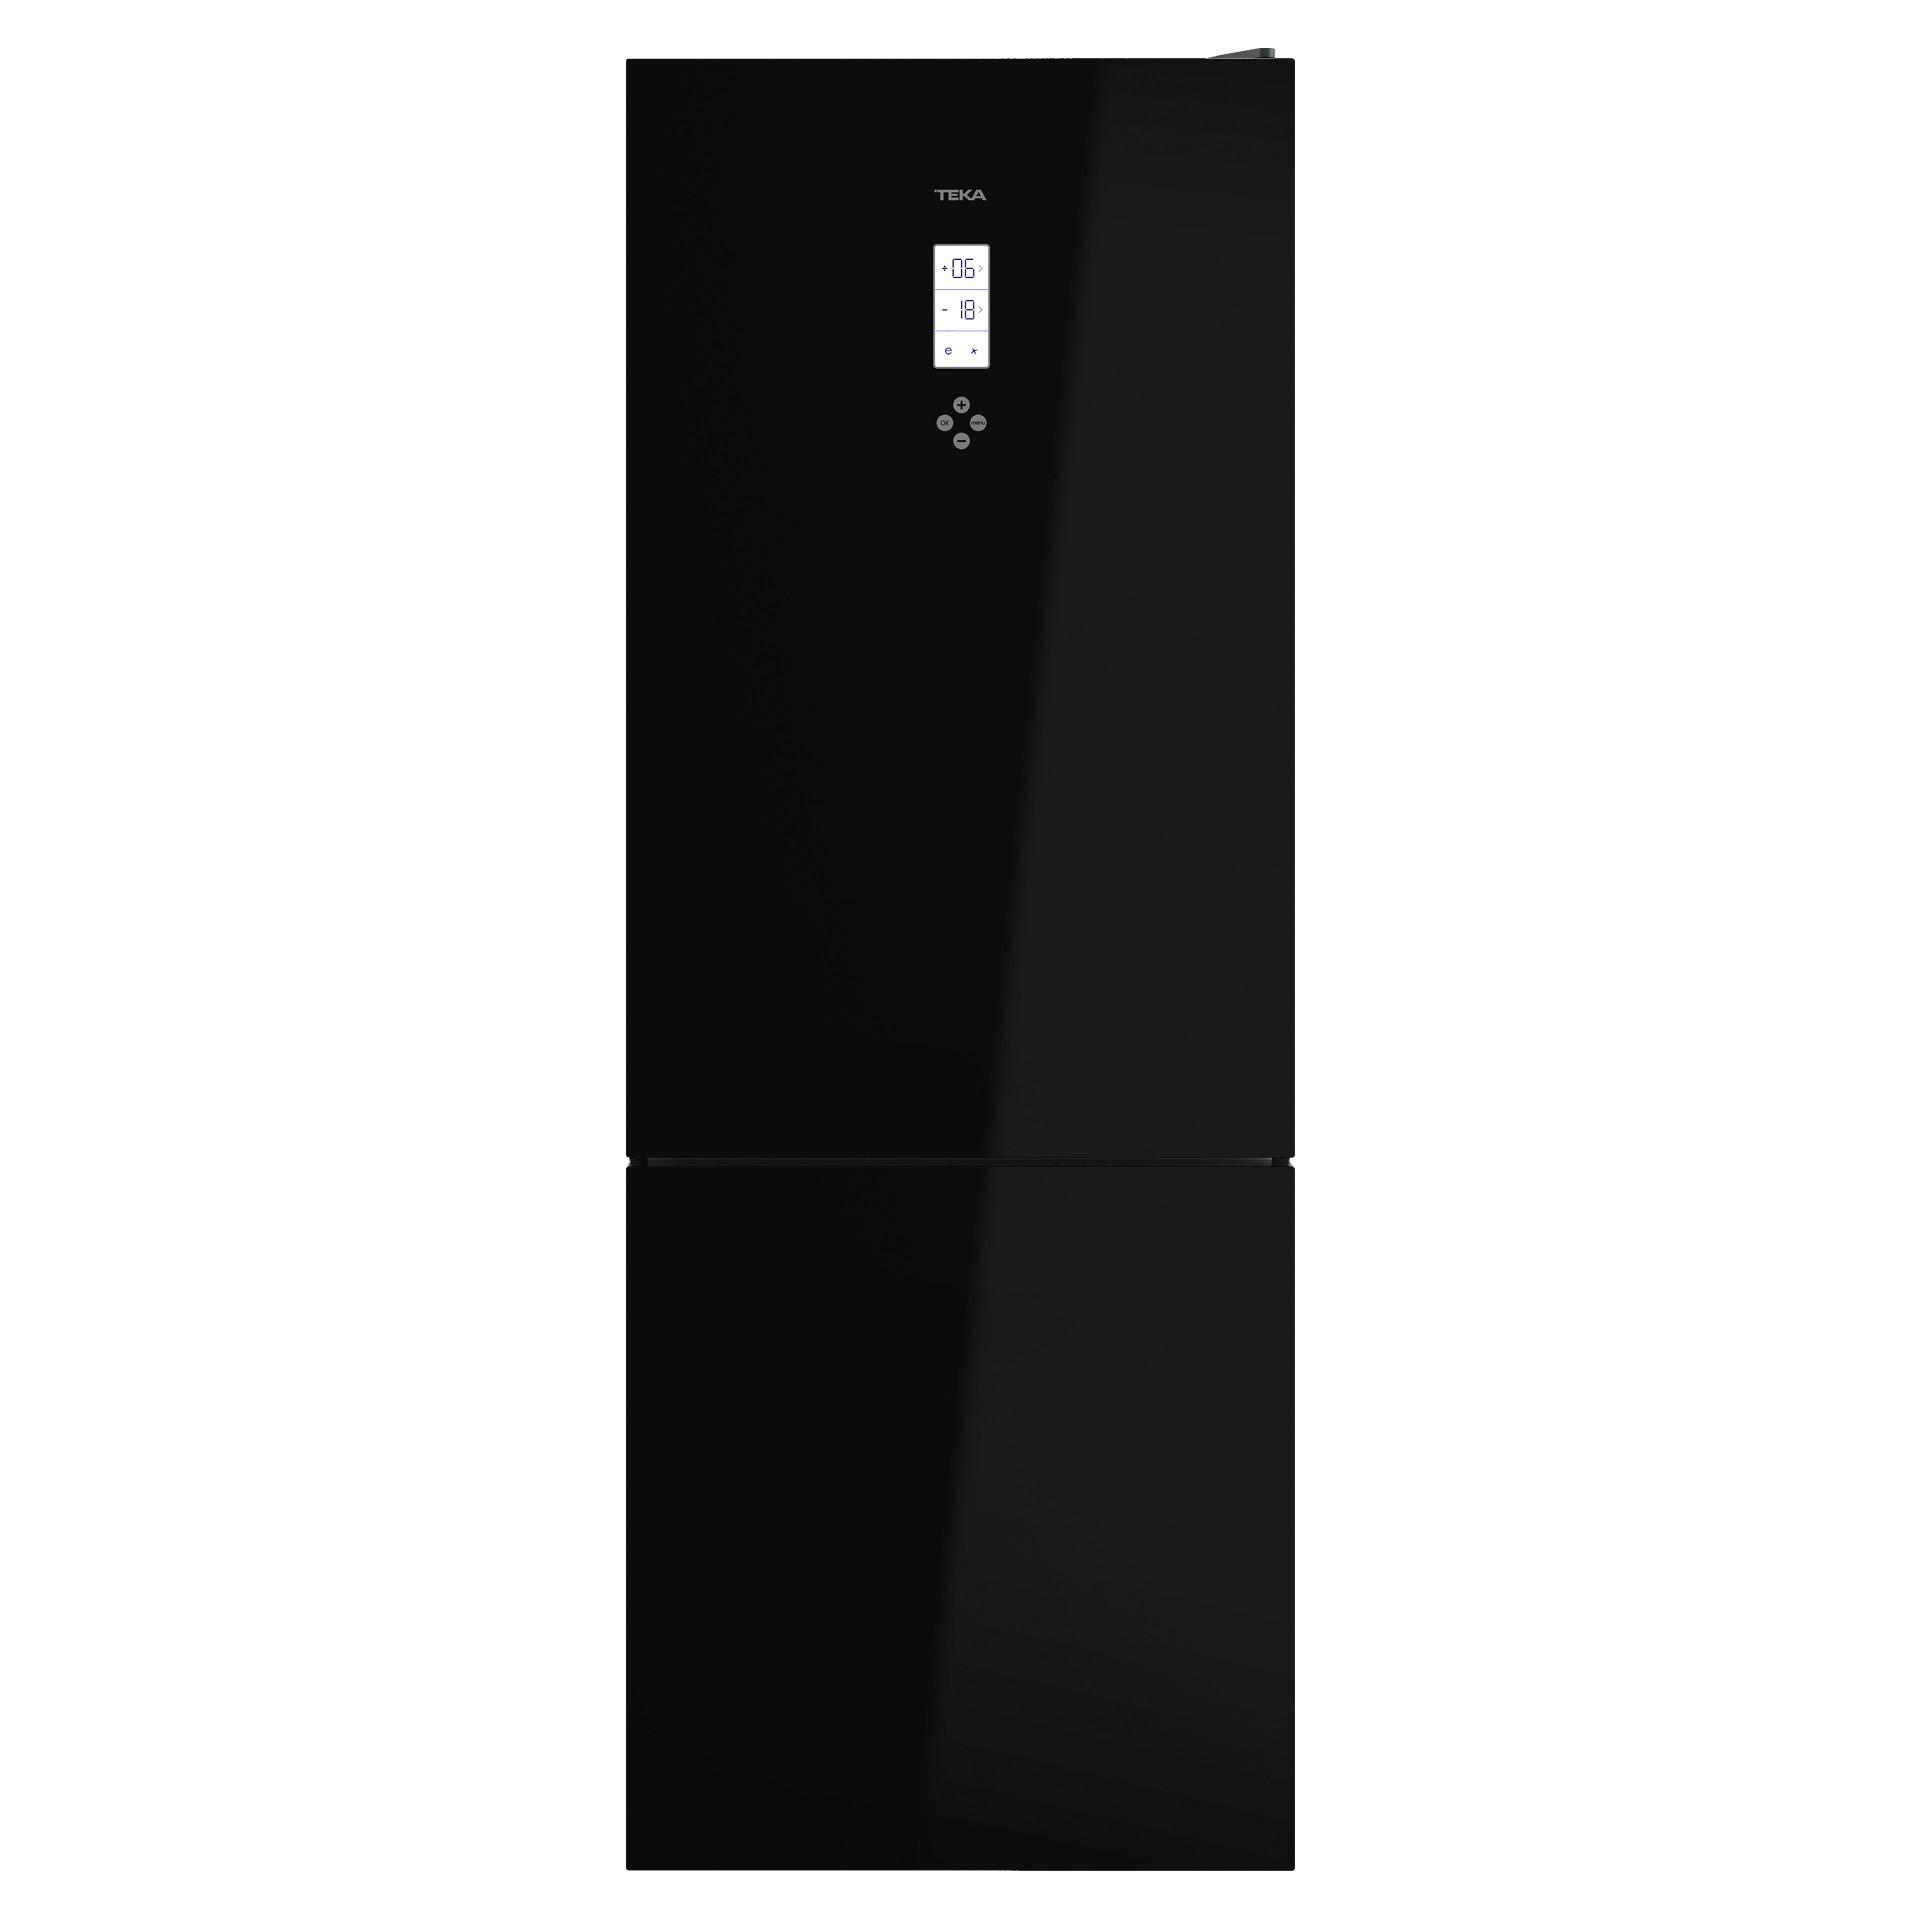 Teka RBF 78720 GBL Ελεύθερος Ψυγειοκαταψύκτης  Black Crystal